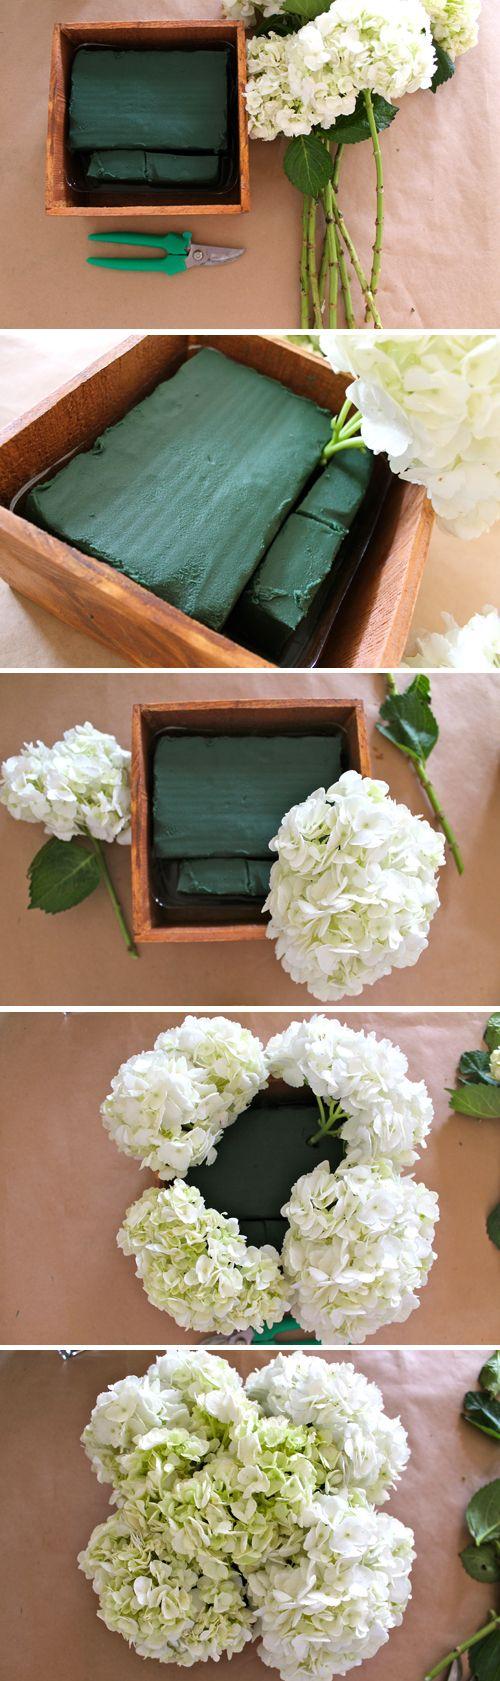 687 best travel wedding center pieces ideas images on pinterest tutorial on creating a beautiful wedding centerpieces junglespirit Images